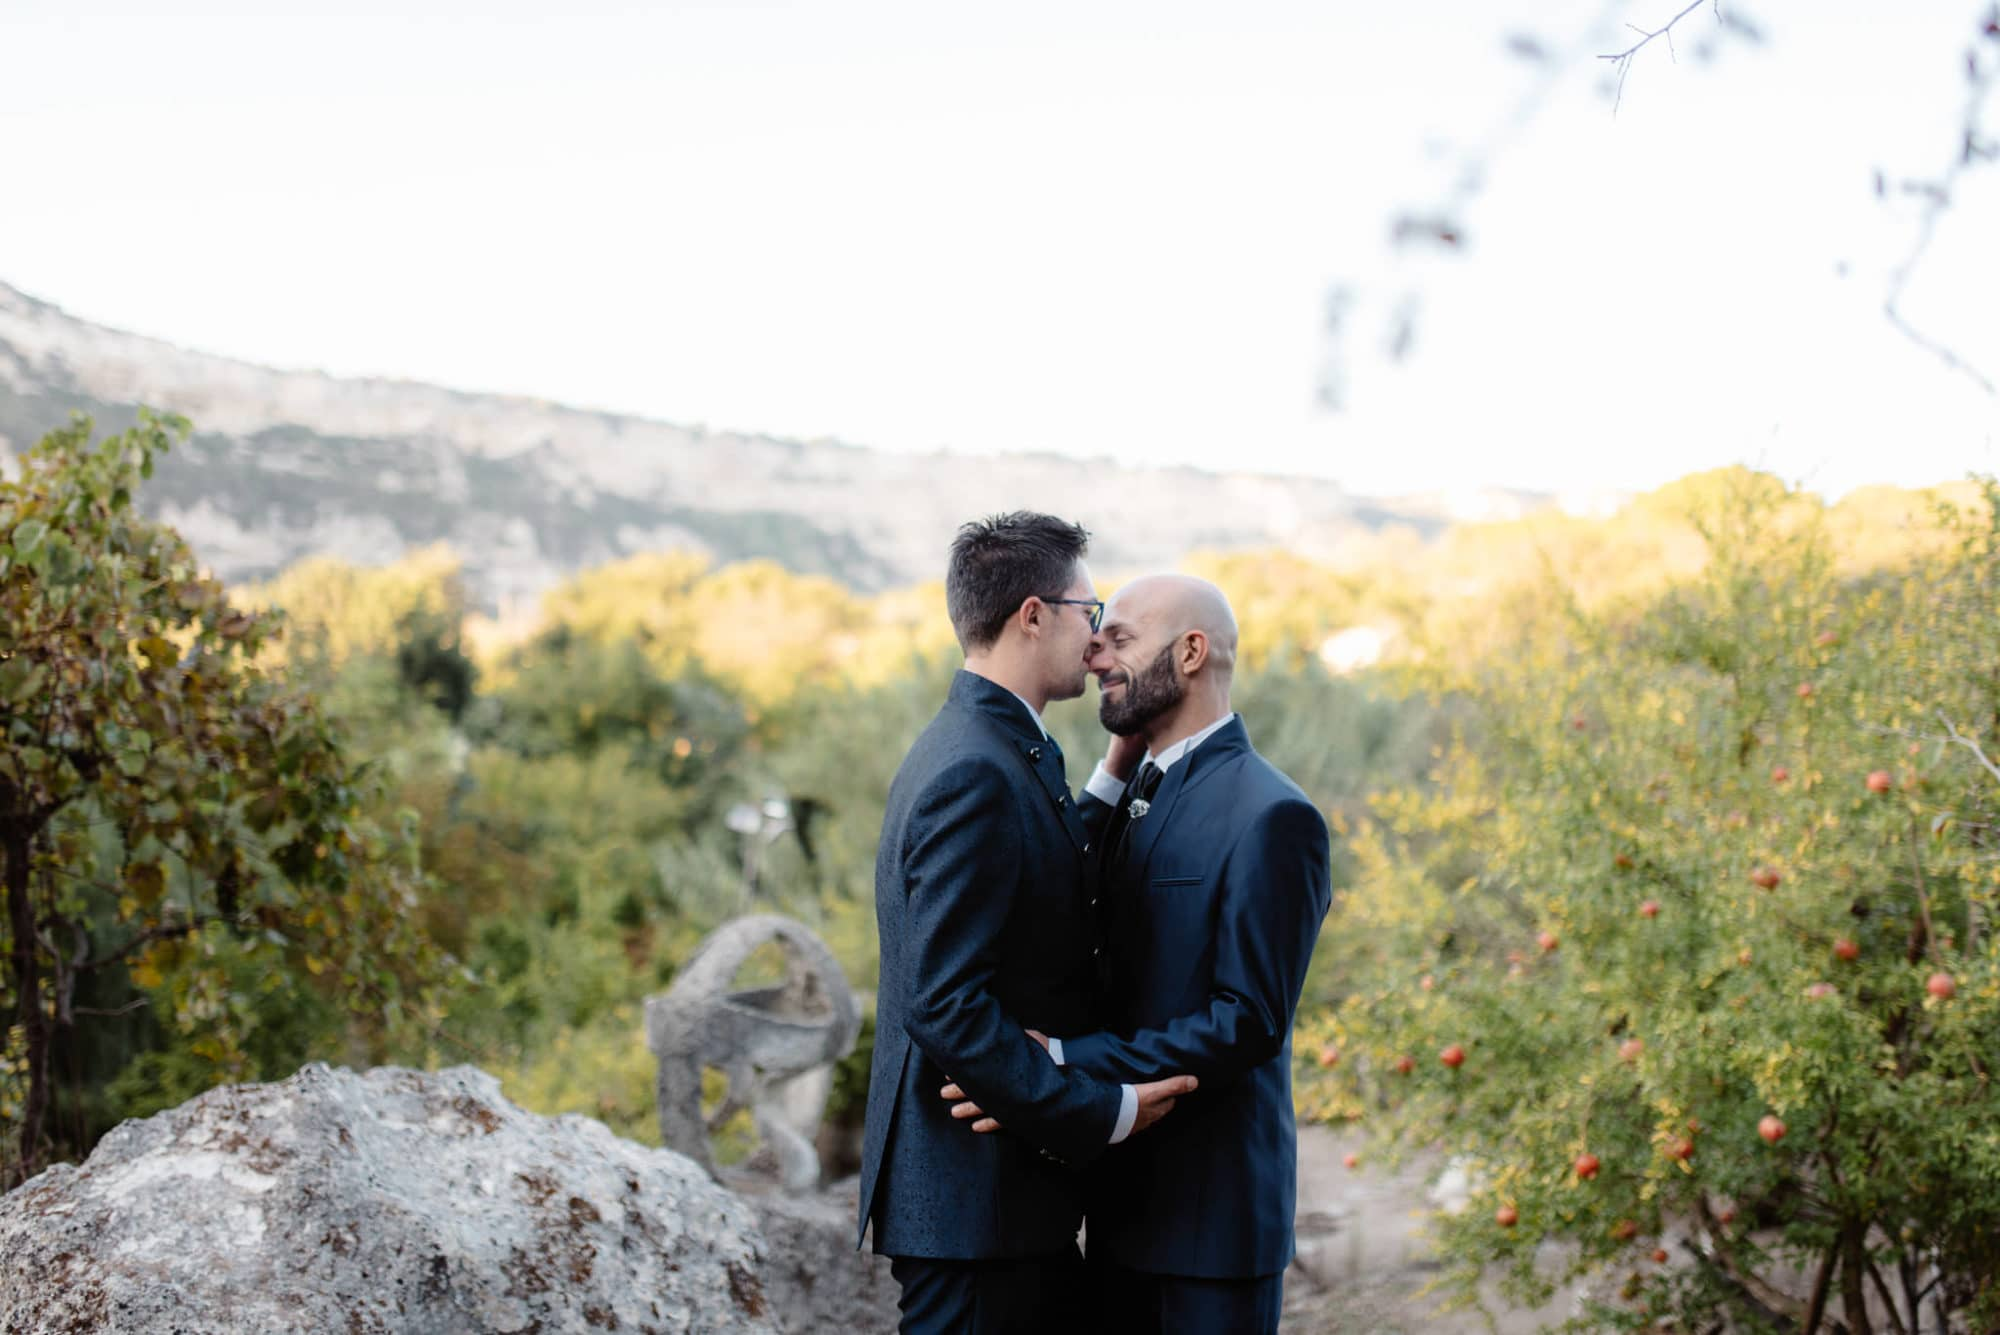 olbia Same-sex wedding